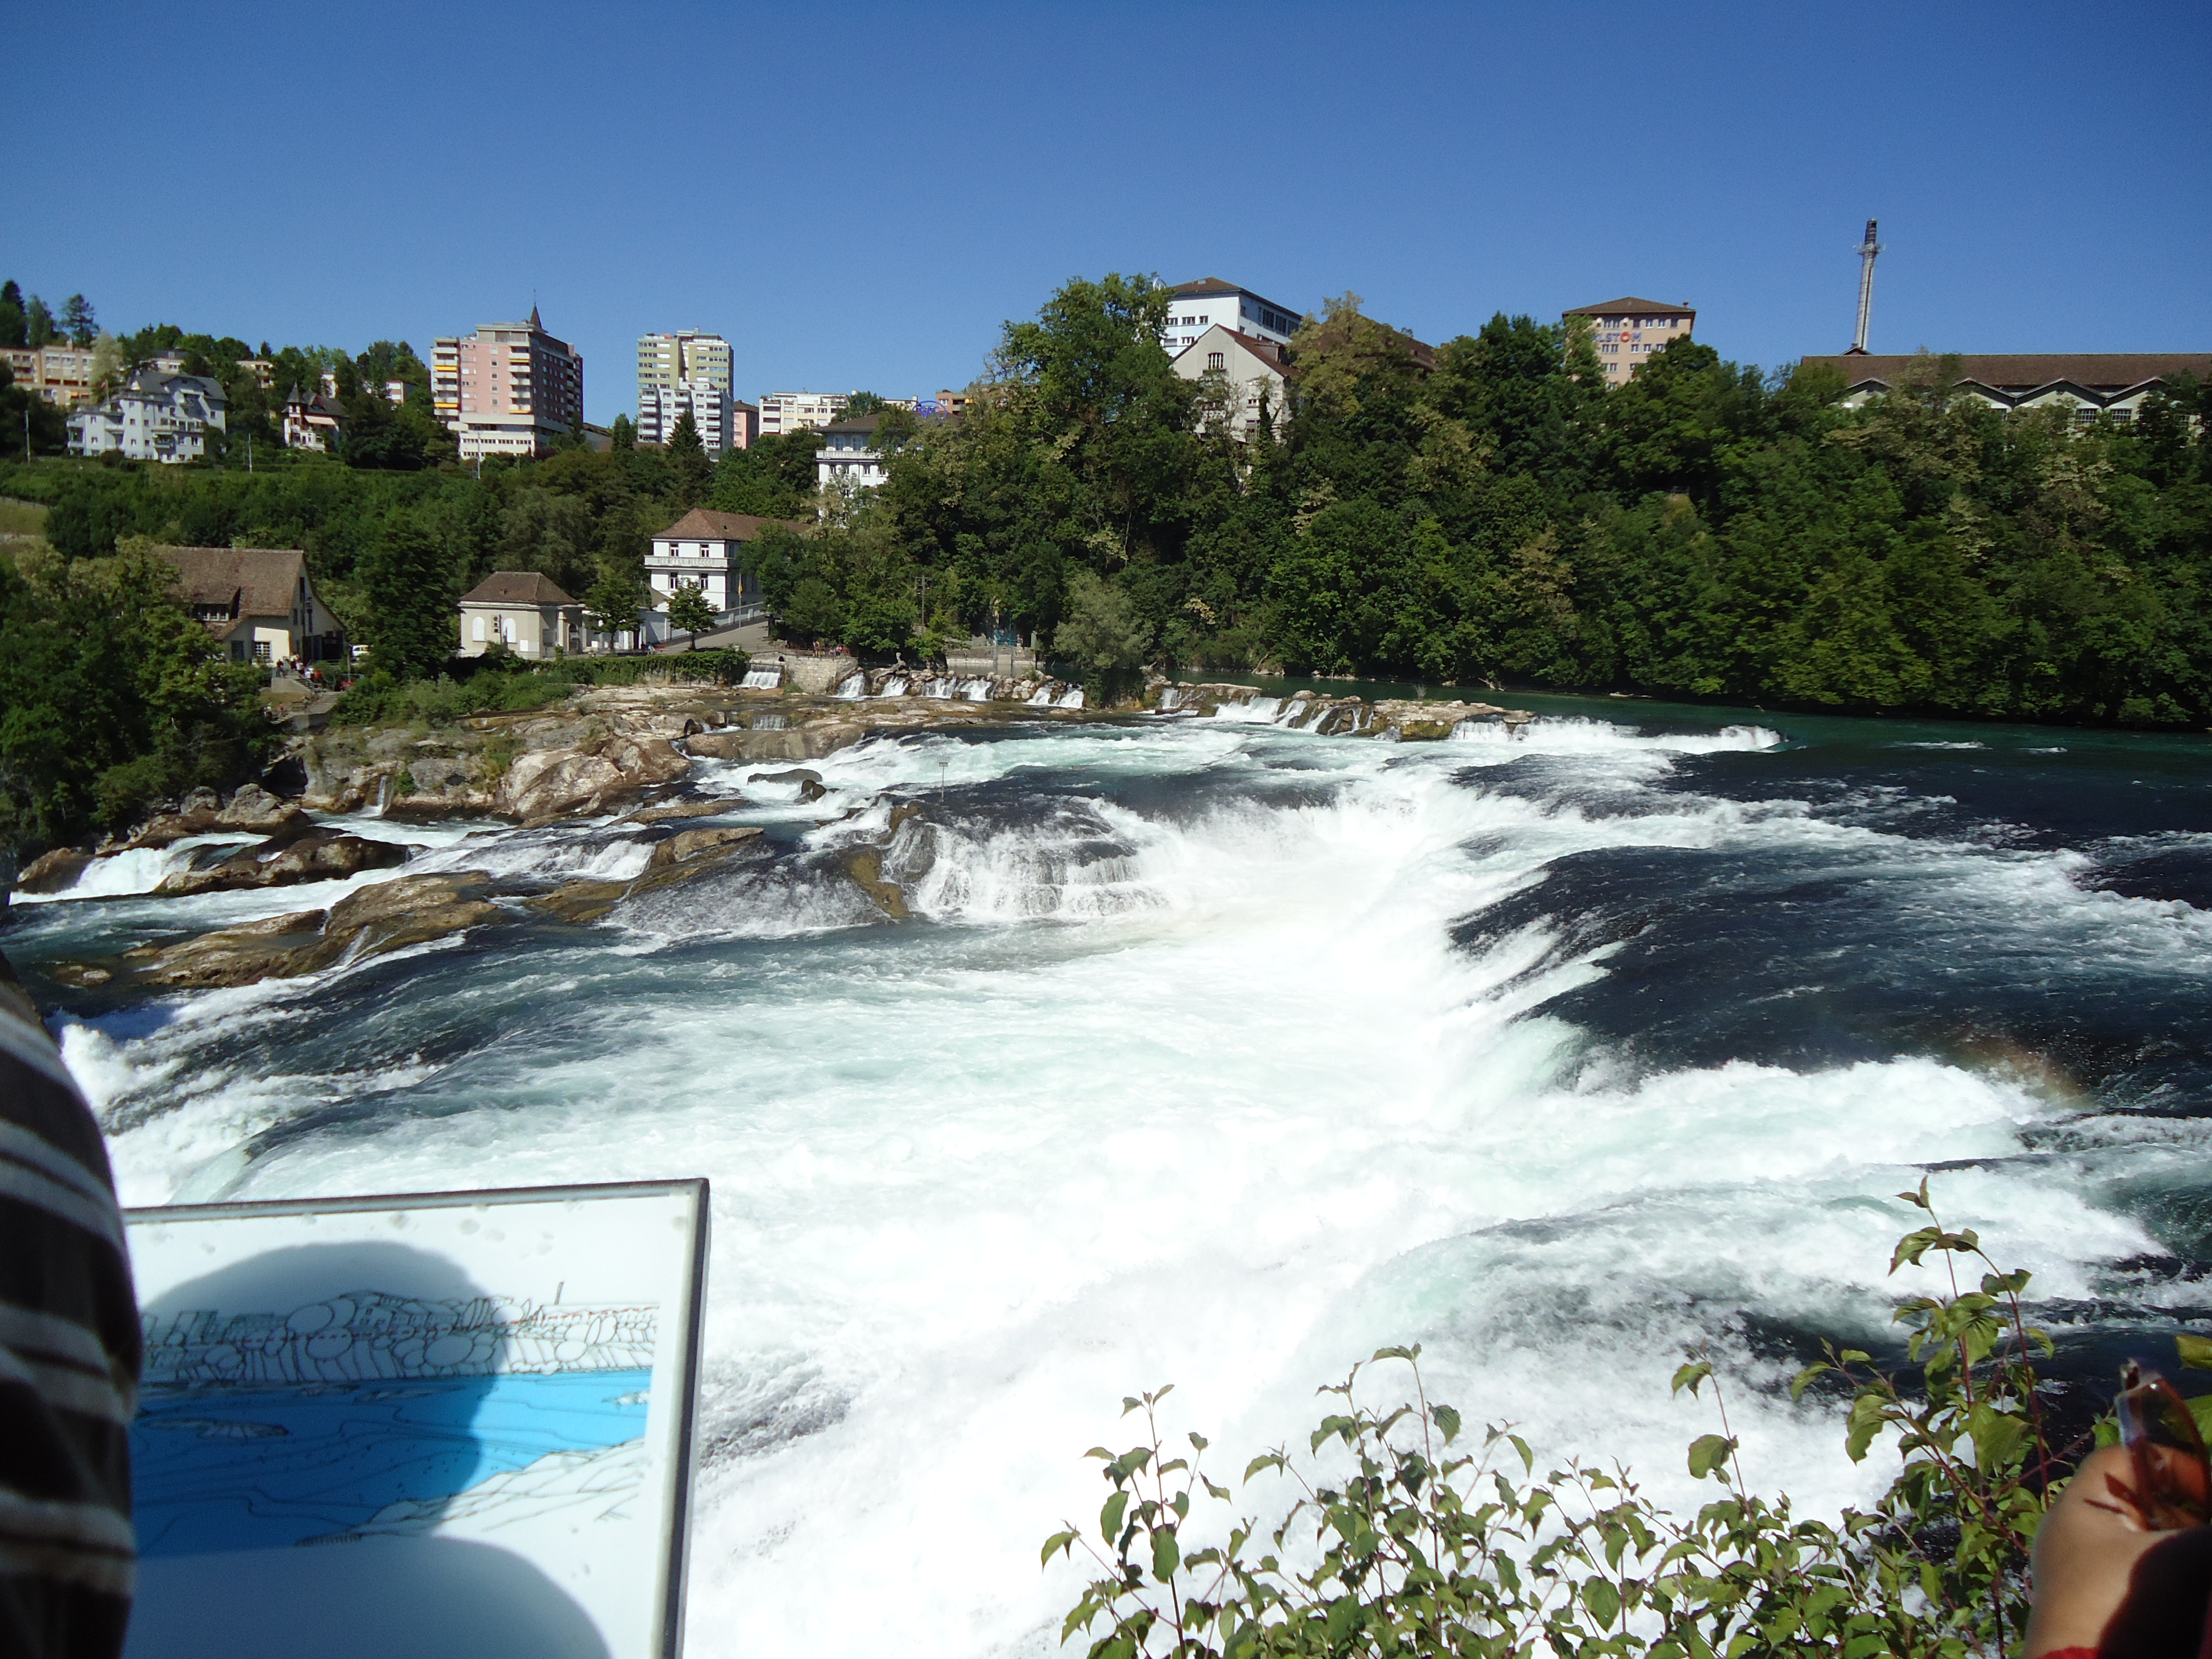 FileRhine Fallas Germany Swiss Border Panoramiojpg Wikimedia - Swiss river to the rhine